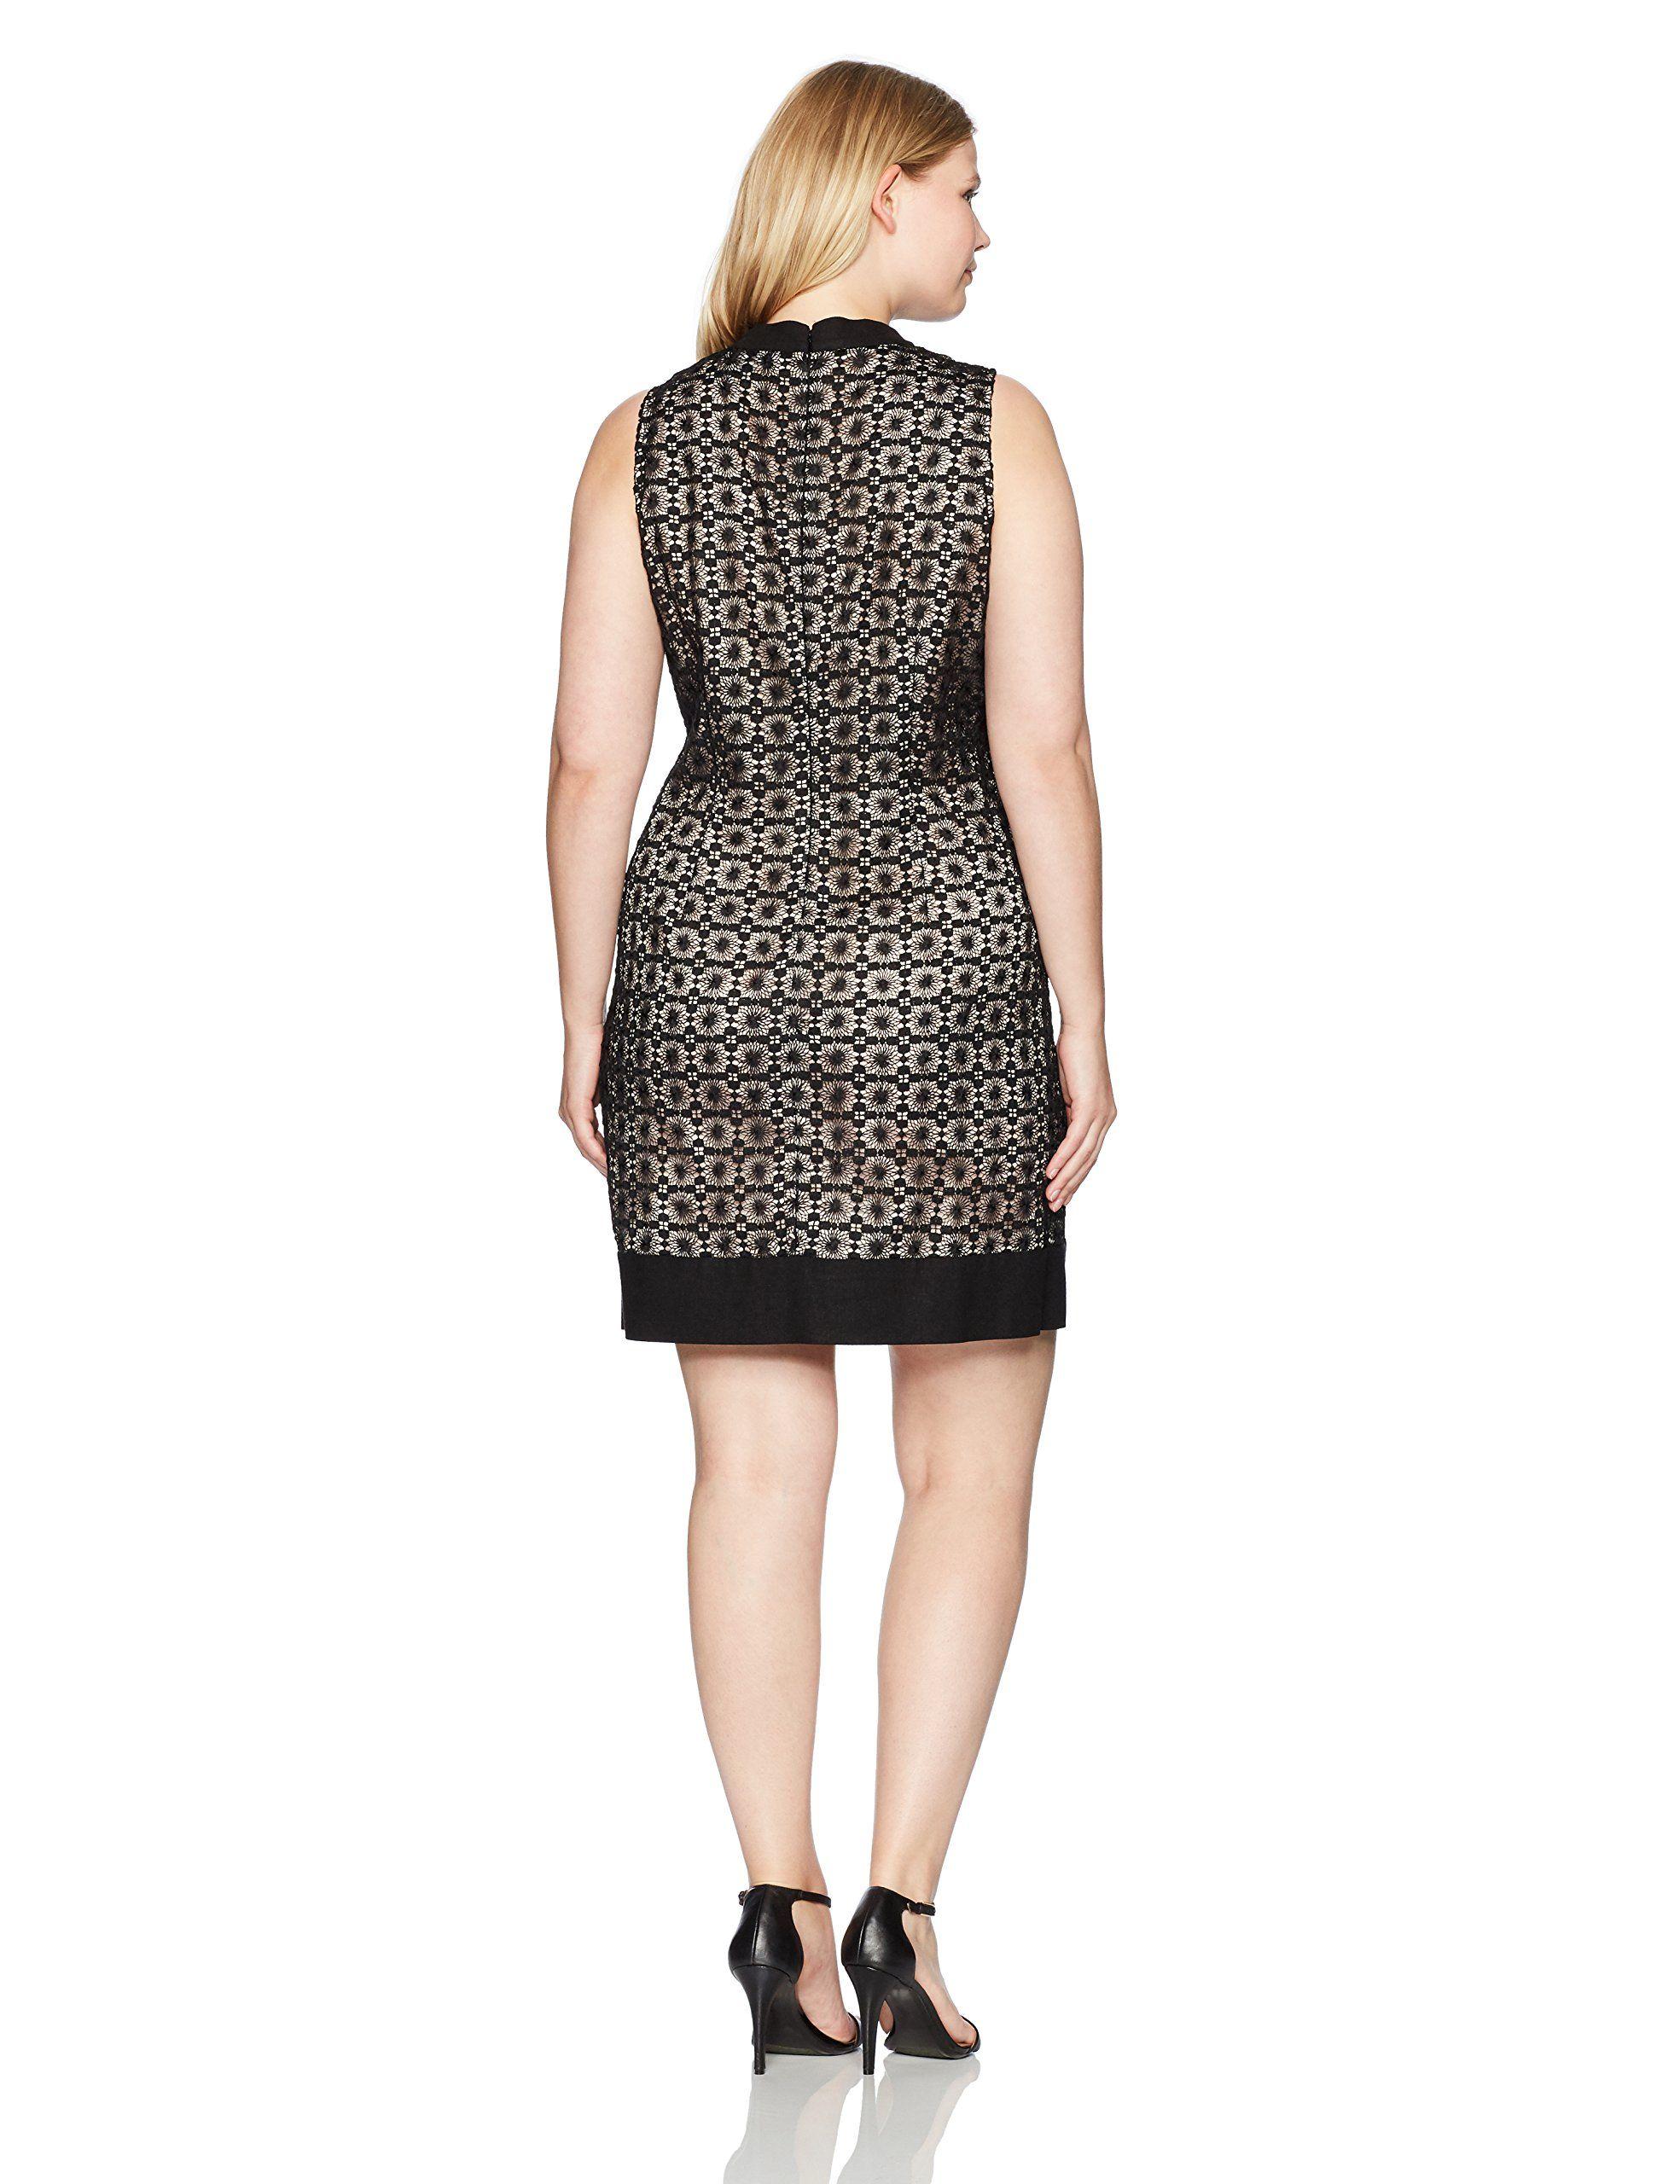 14w Dress Size Shift Pink Jessica Plus Womens Framed Blackls Howard 7IYfygvmb6